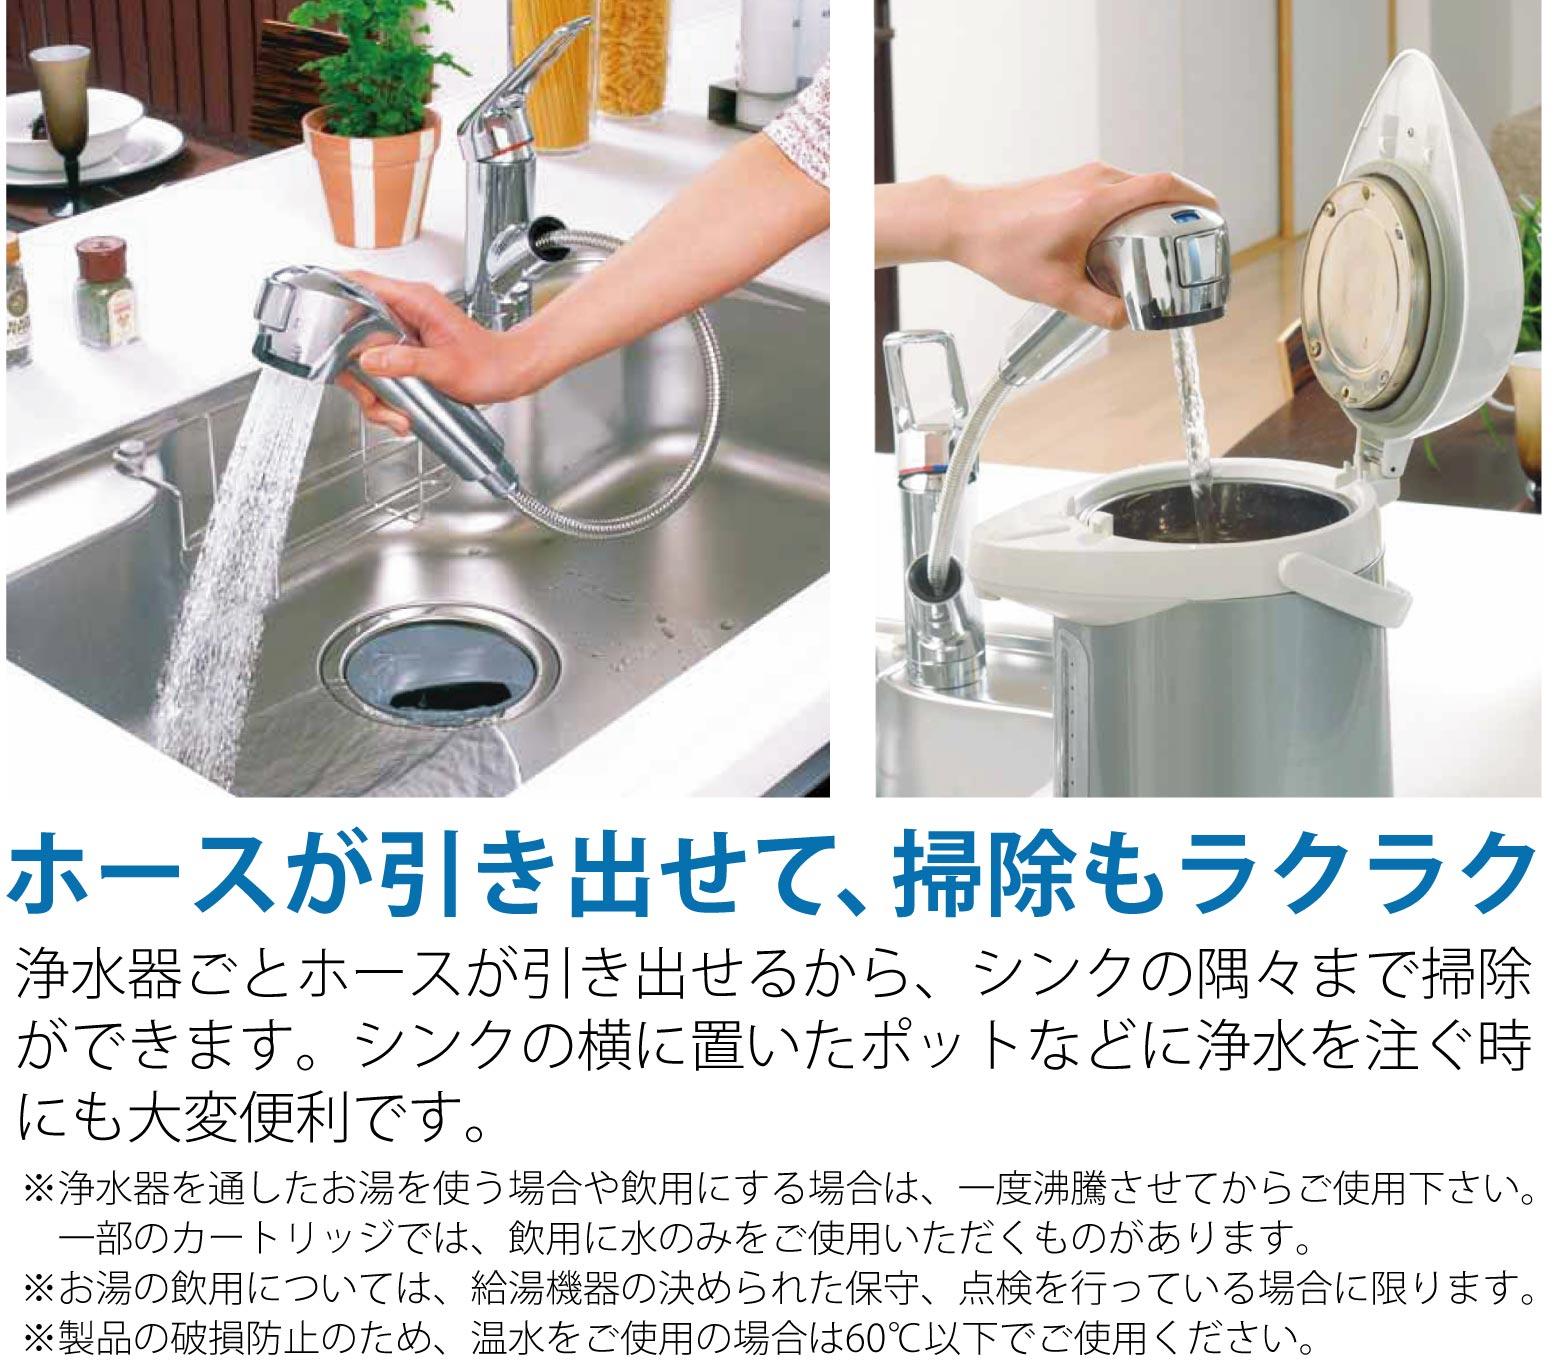 KuraSi-natu-sin76-14.jpg